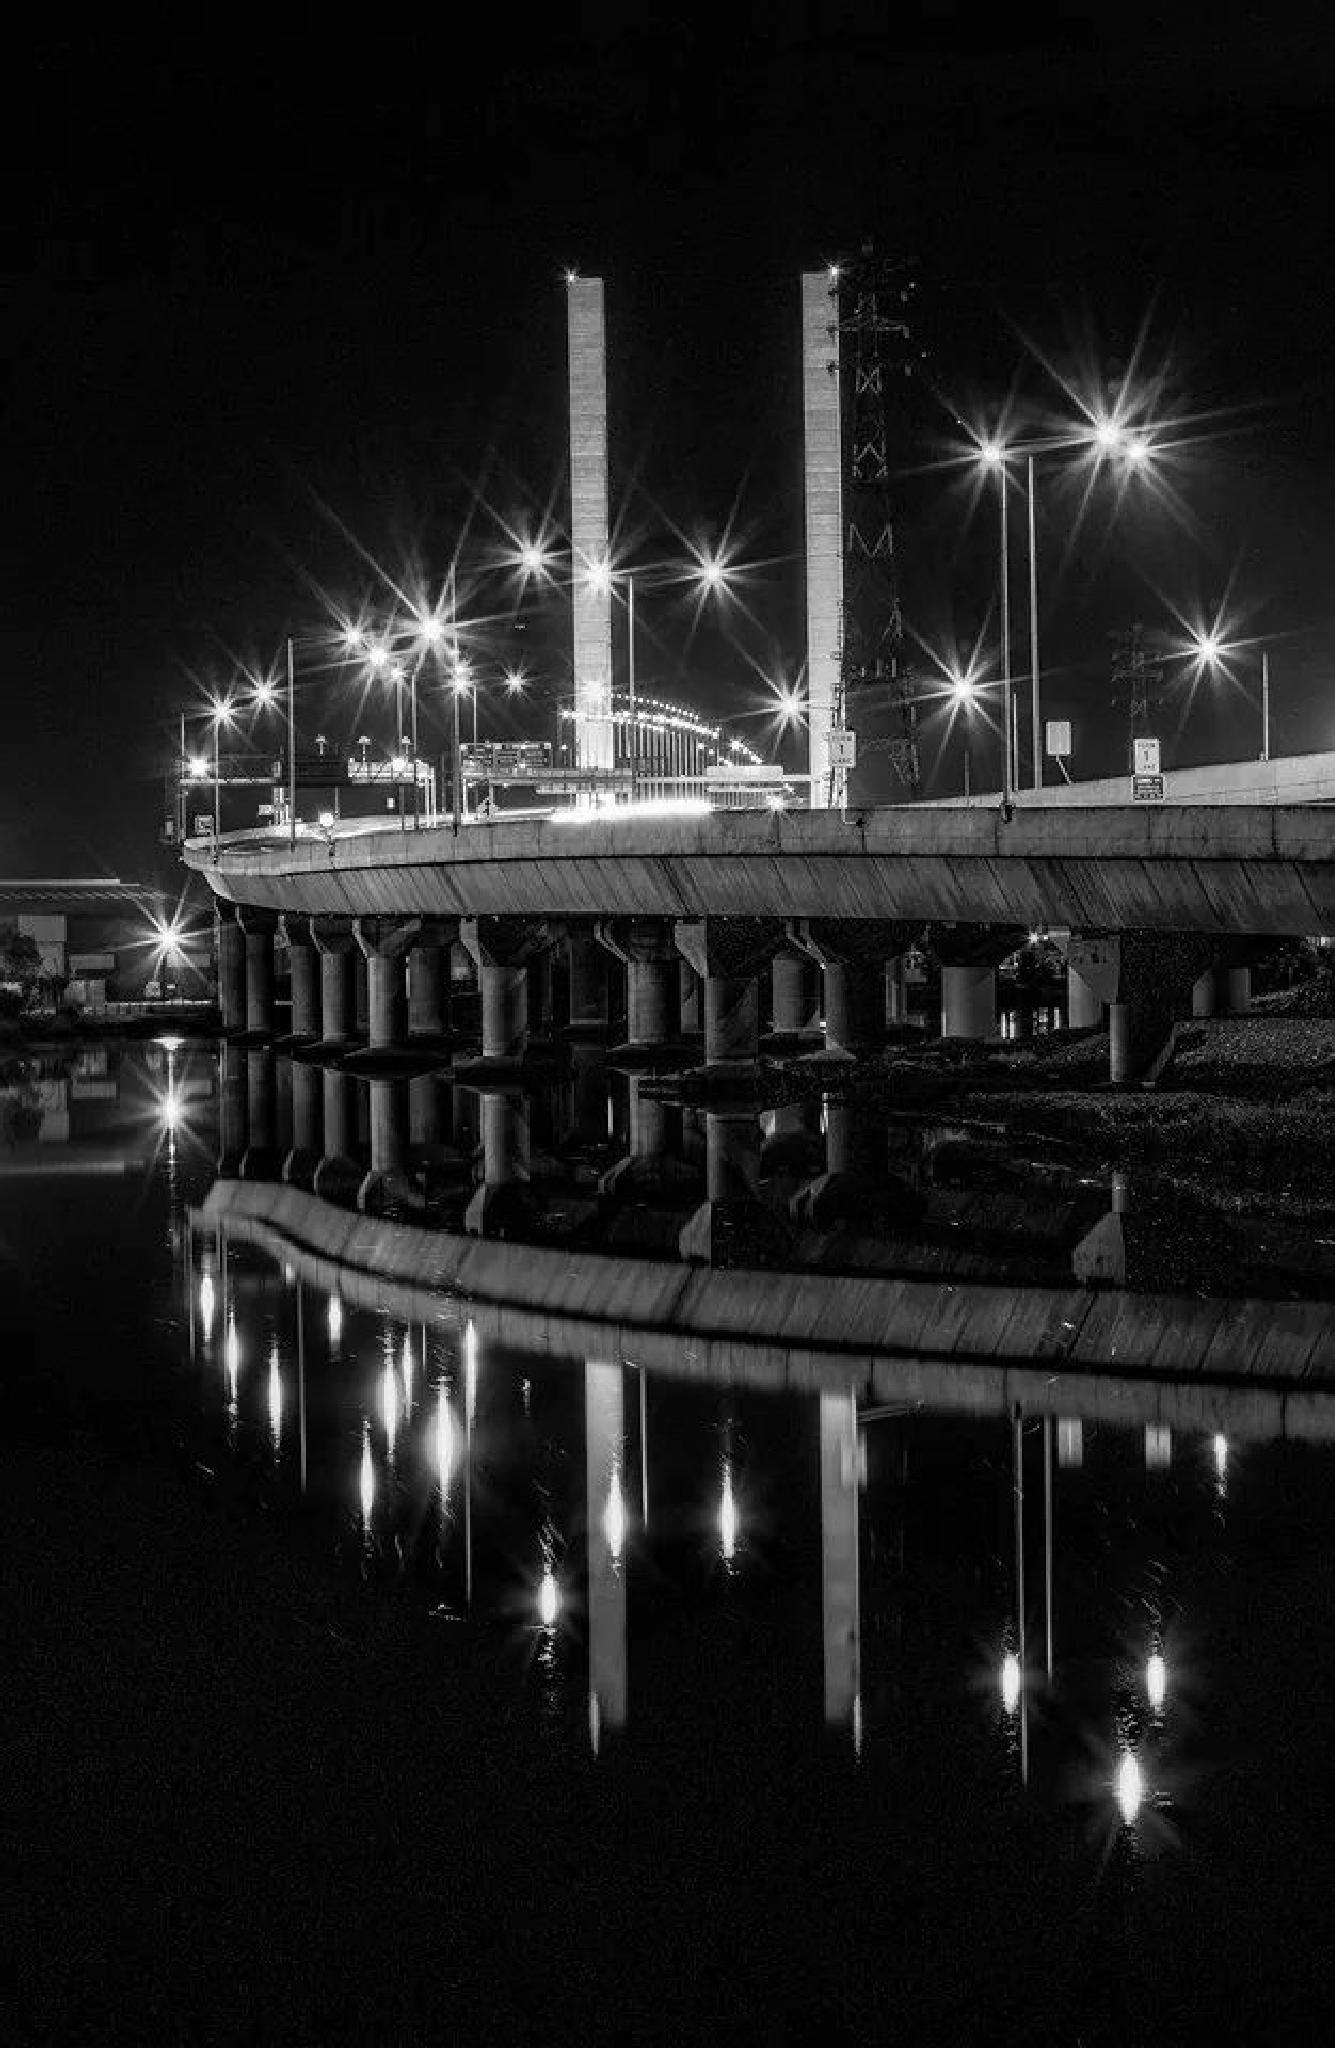 The Bolte Bridge by CareyCarter